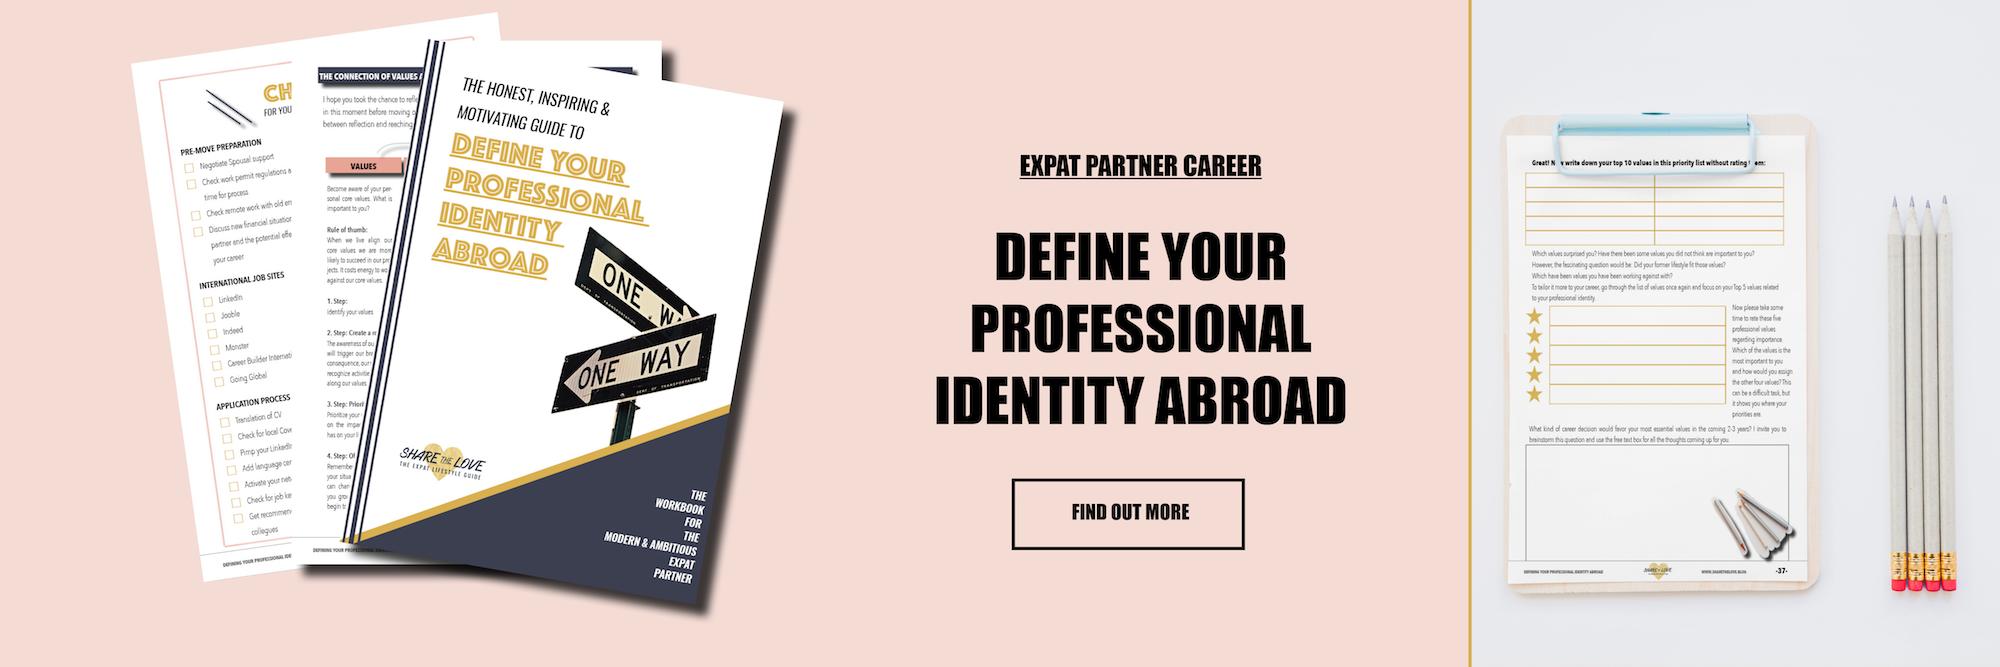 workbook, expat partner, career planning, sharethelove, expat